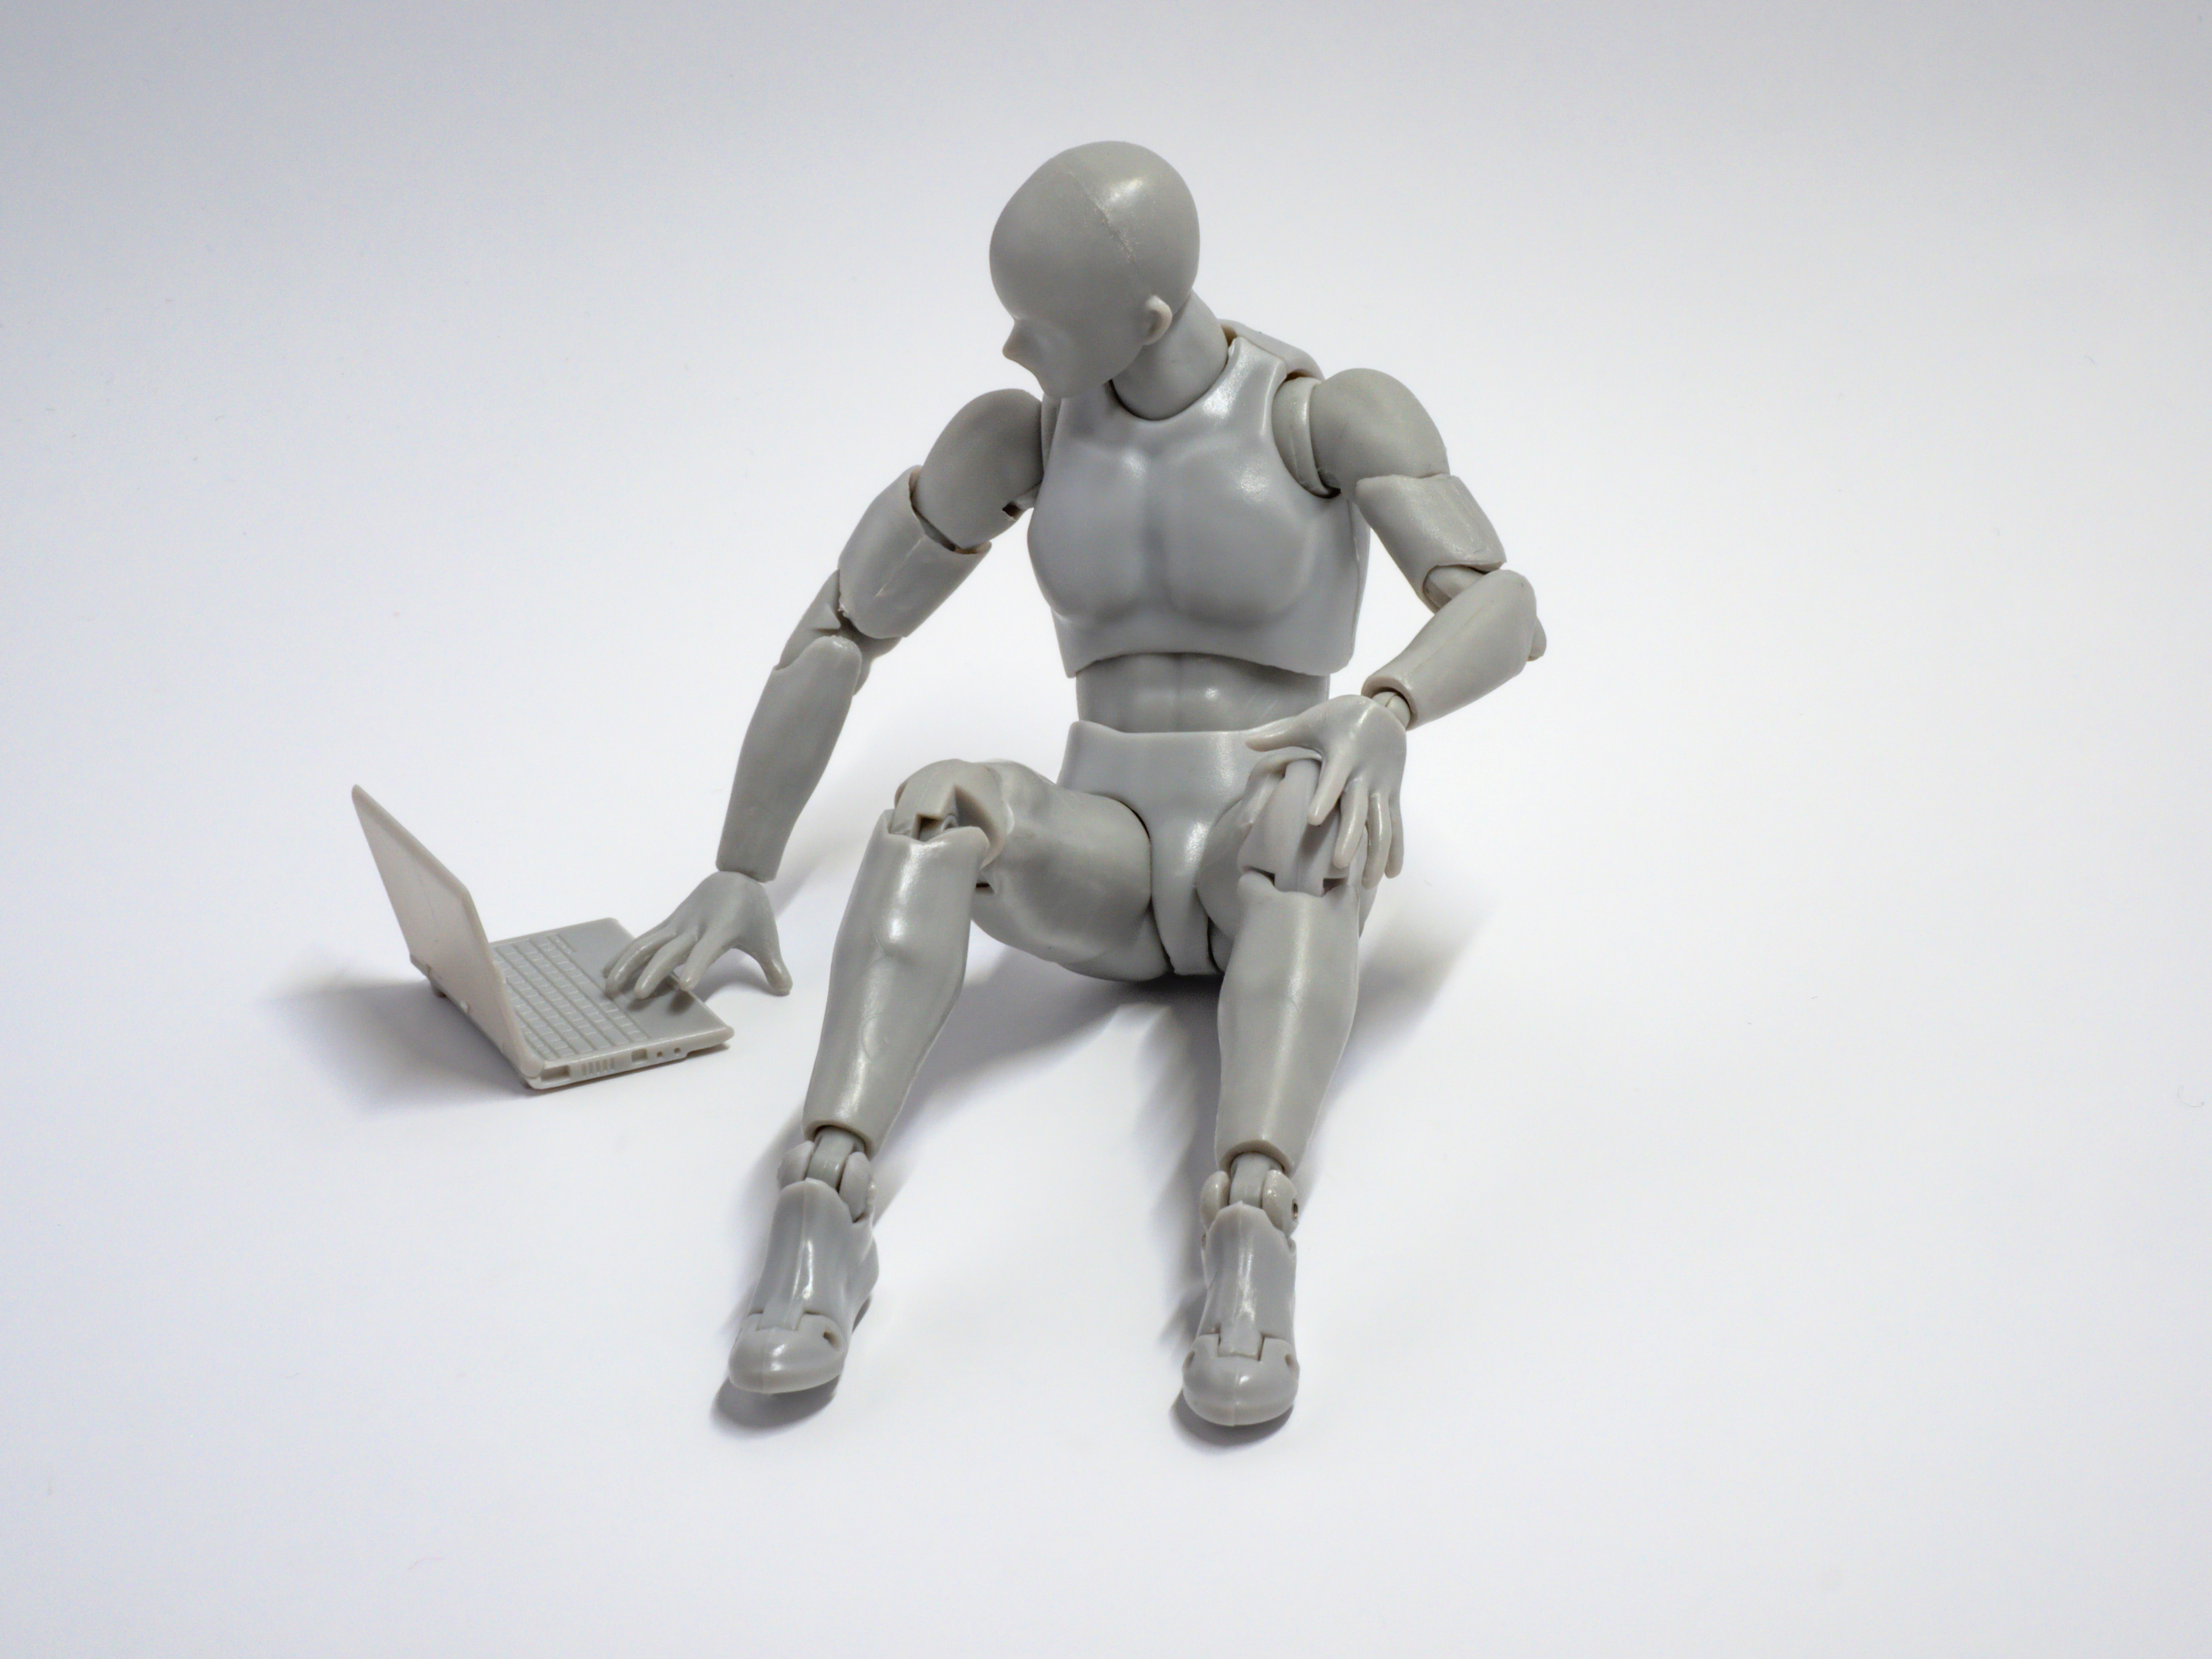 Pekerjaan di Masa Depan yang Akan Digantikan oleh Robot